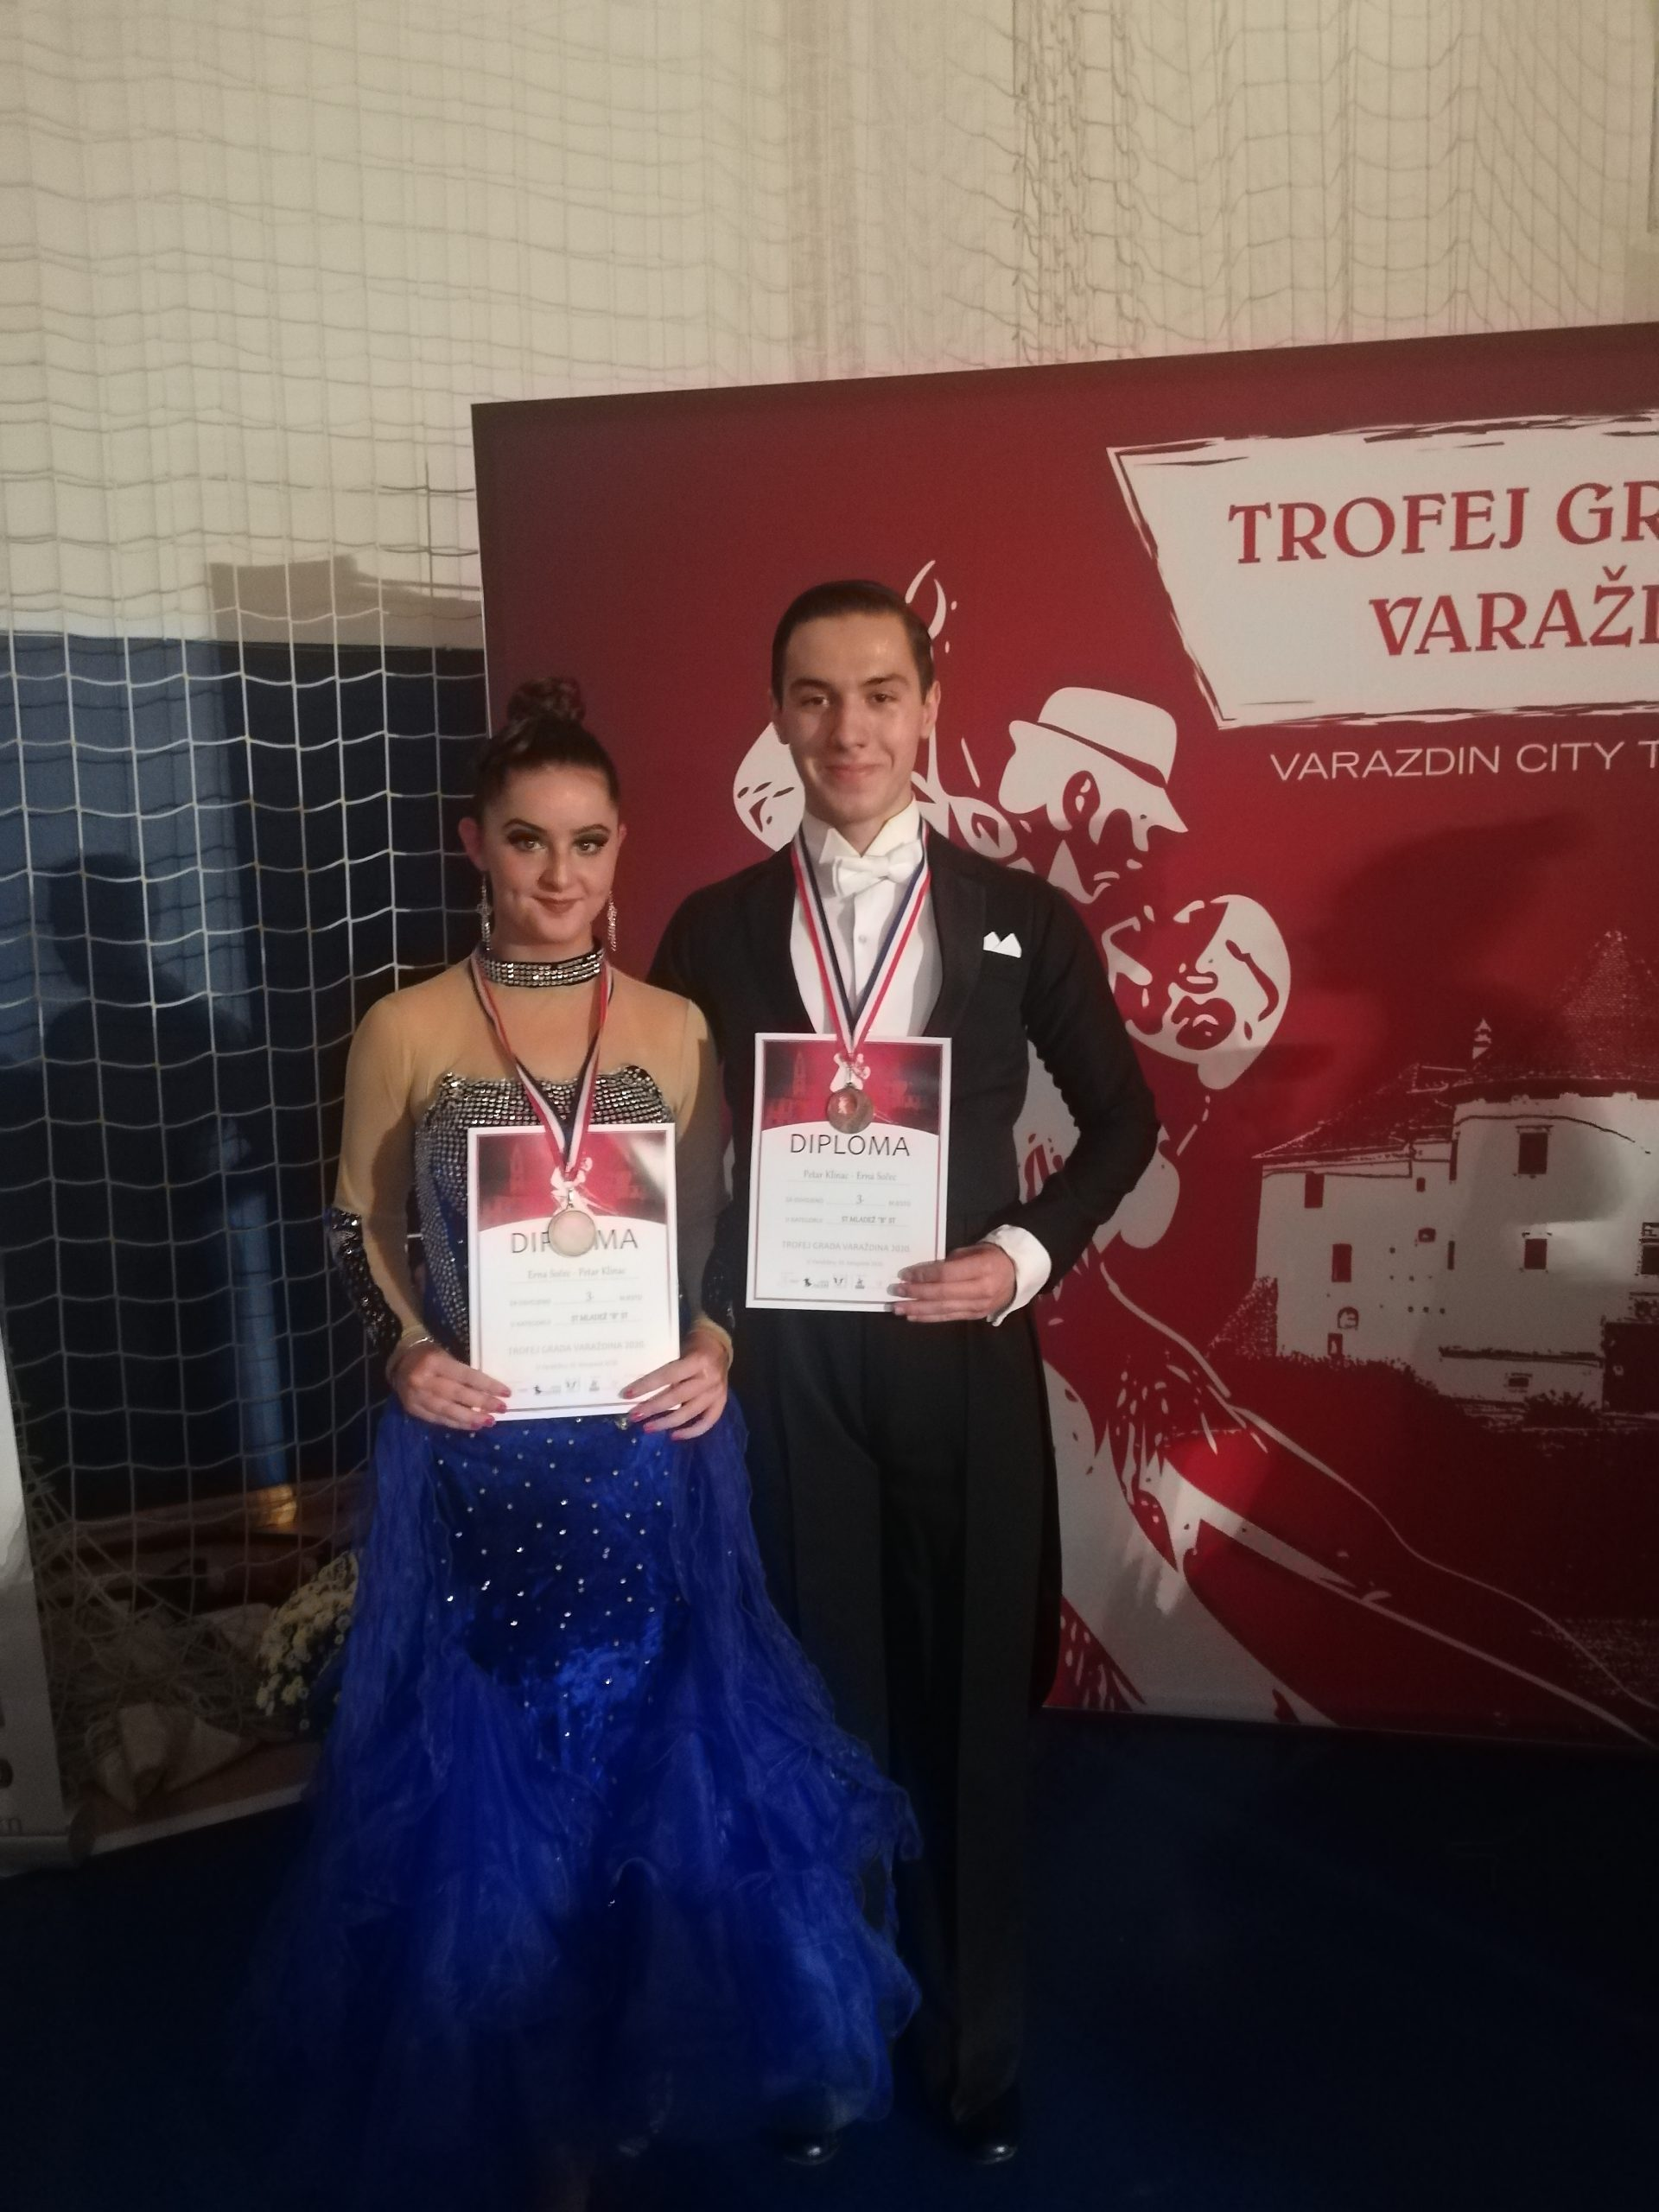 NOVI USPJEH Bjelovarski plesači iz Varaždina stigli s hrpom medalja